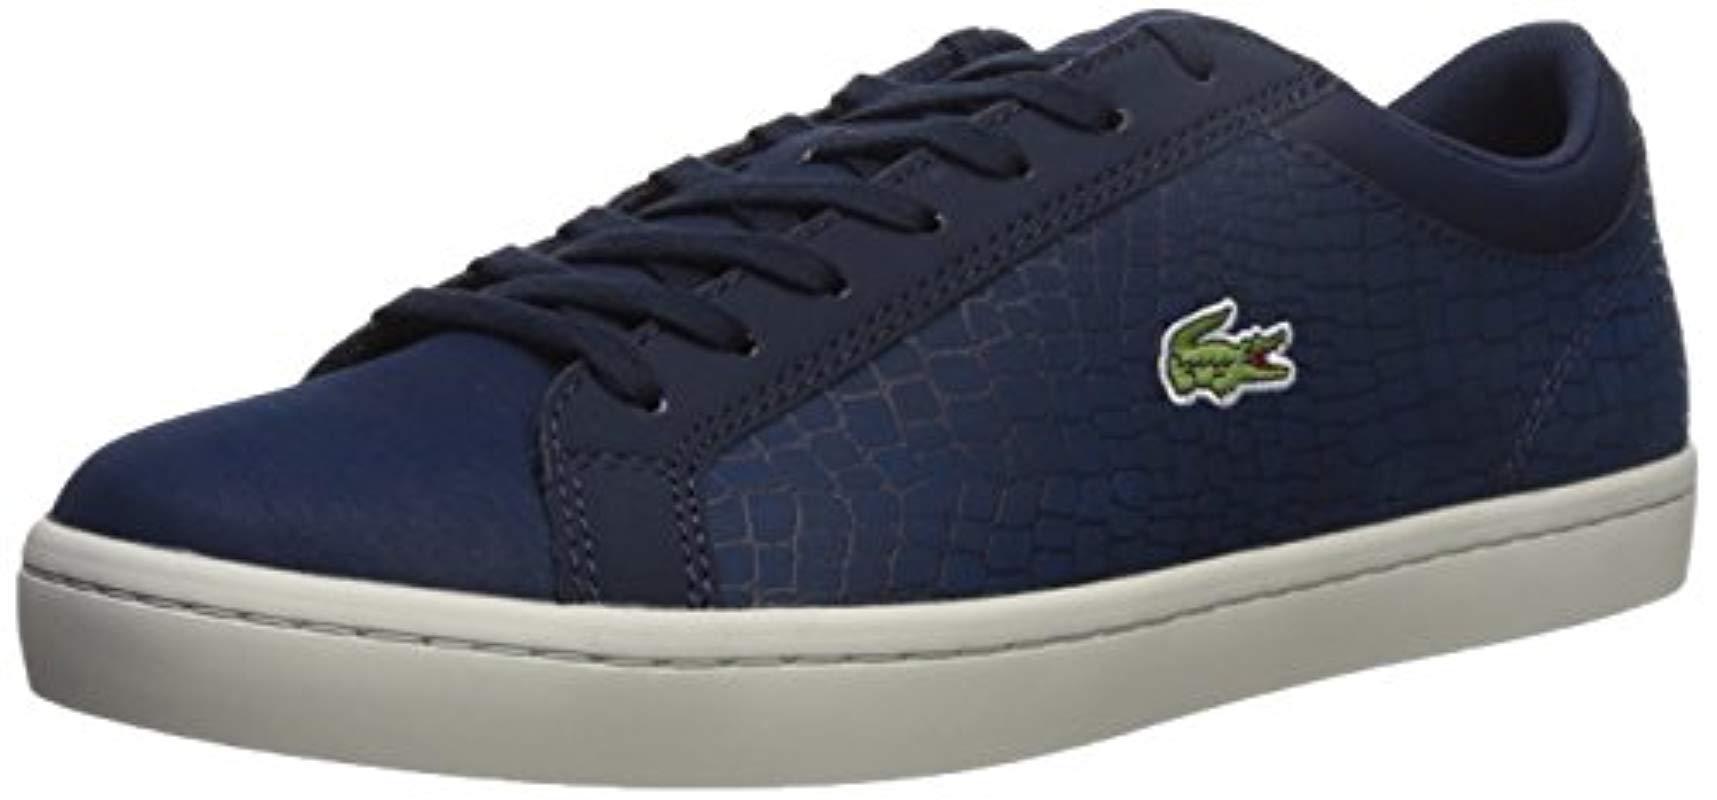 860700133fb6d Lyst - Lacoste Straightset Sp 417 1 Sneaker in Blue for Men